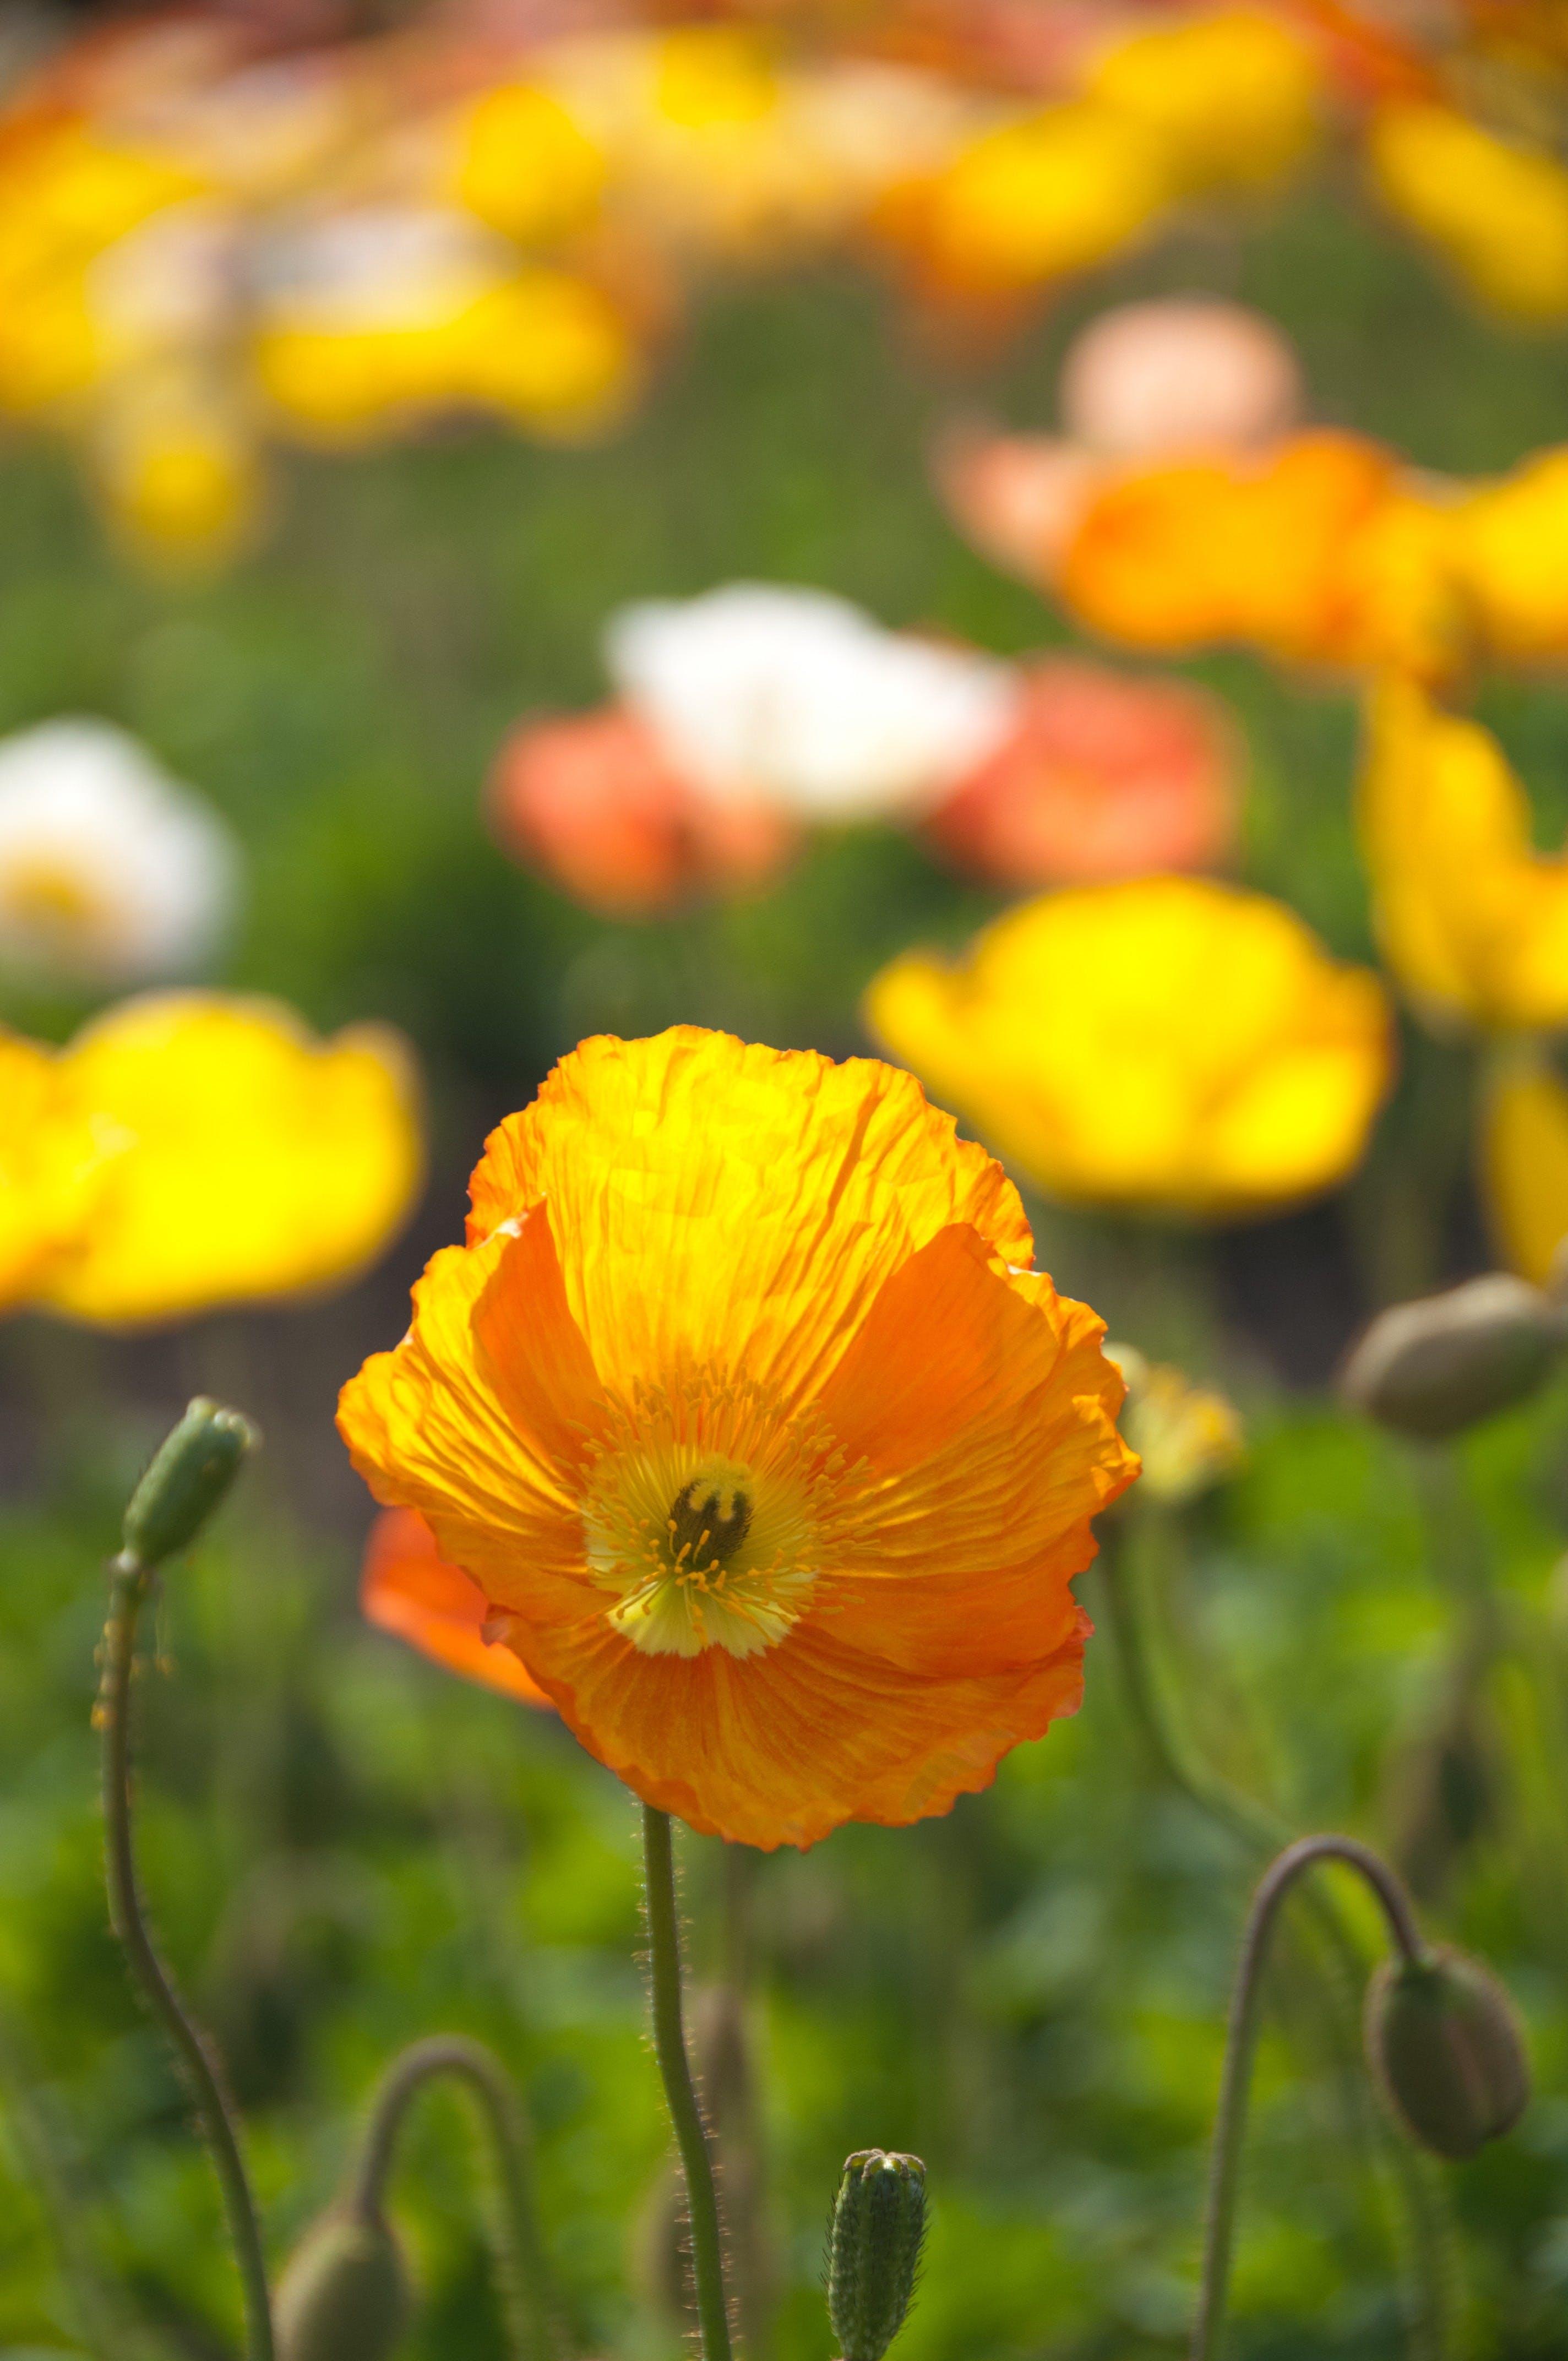 Selective Focus Photography of Orange Poppy Flower Field